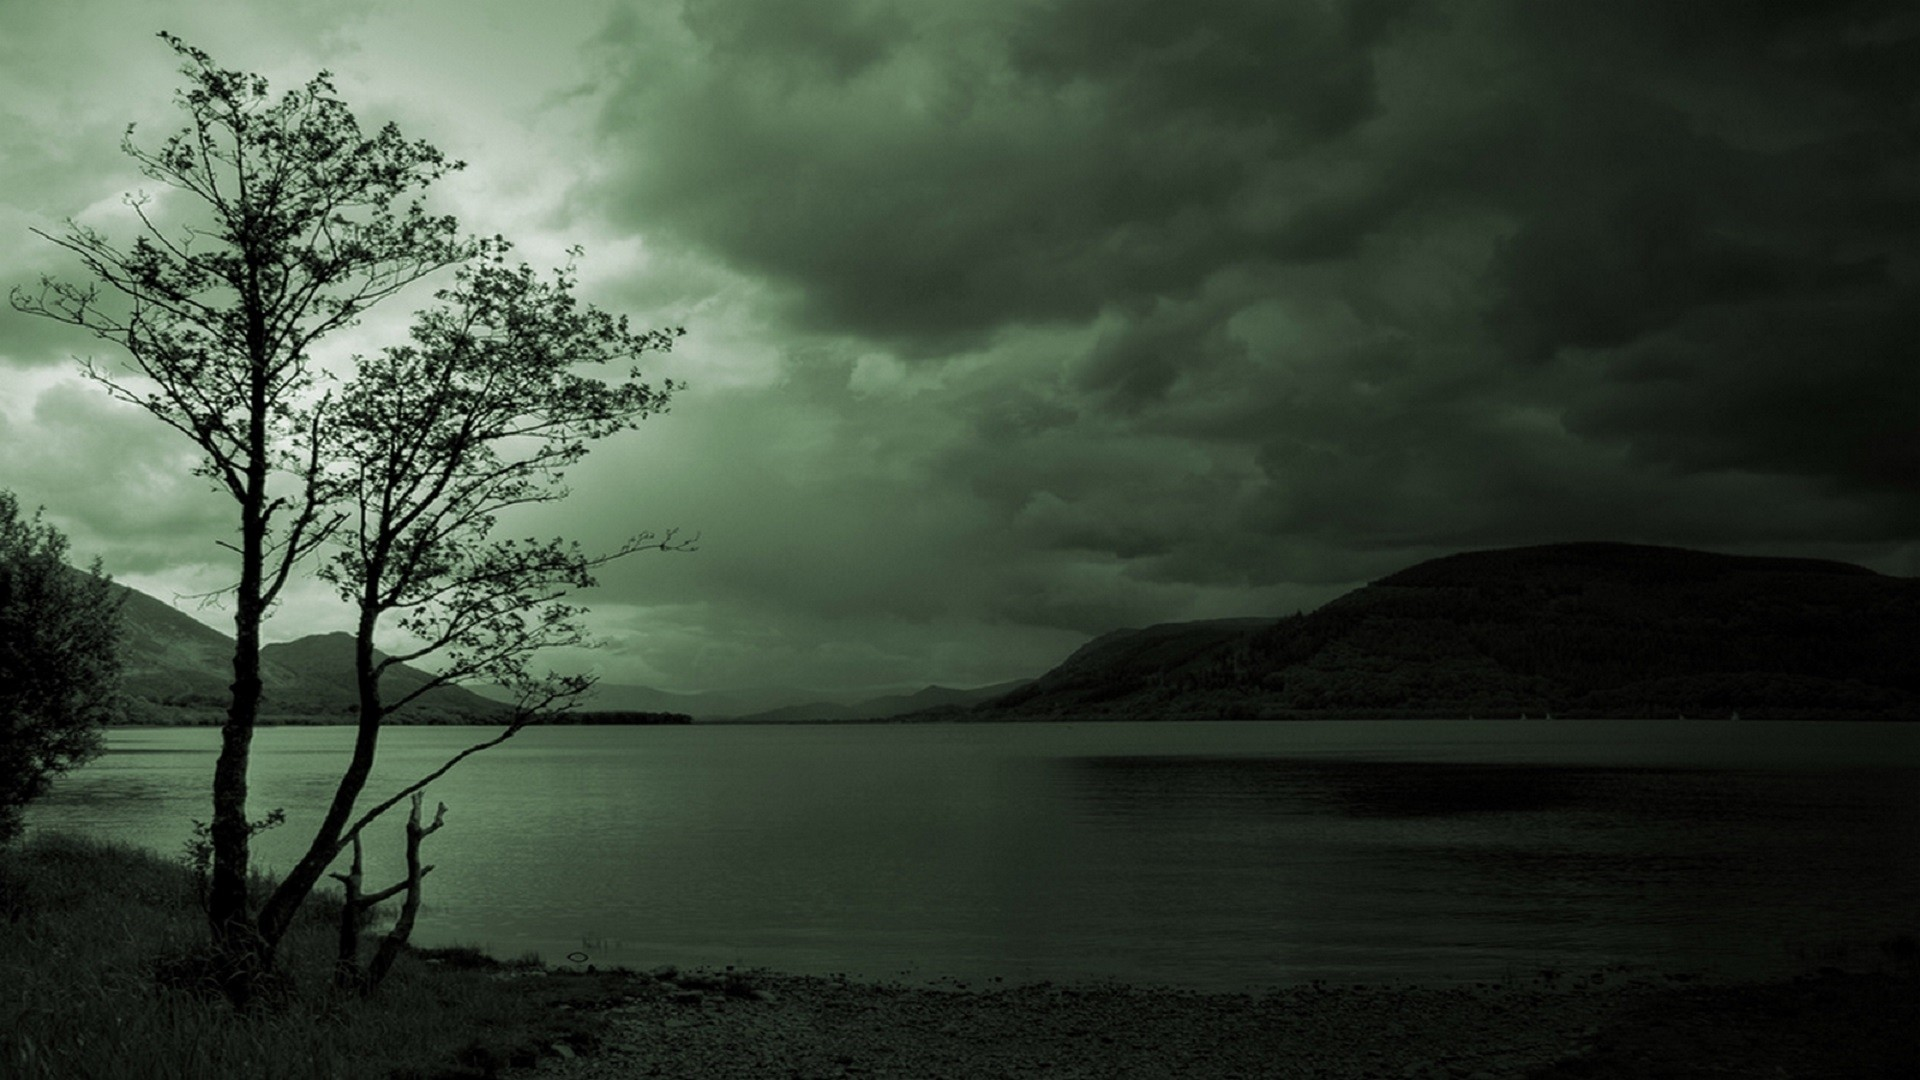 Gloomy HD Download